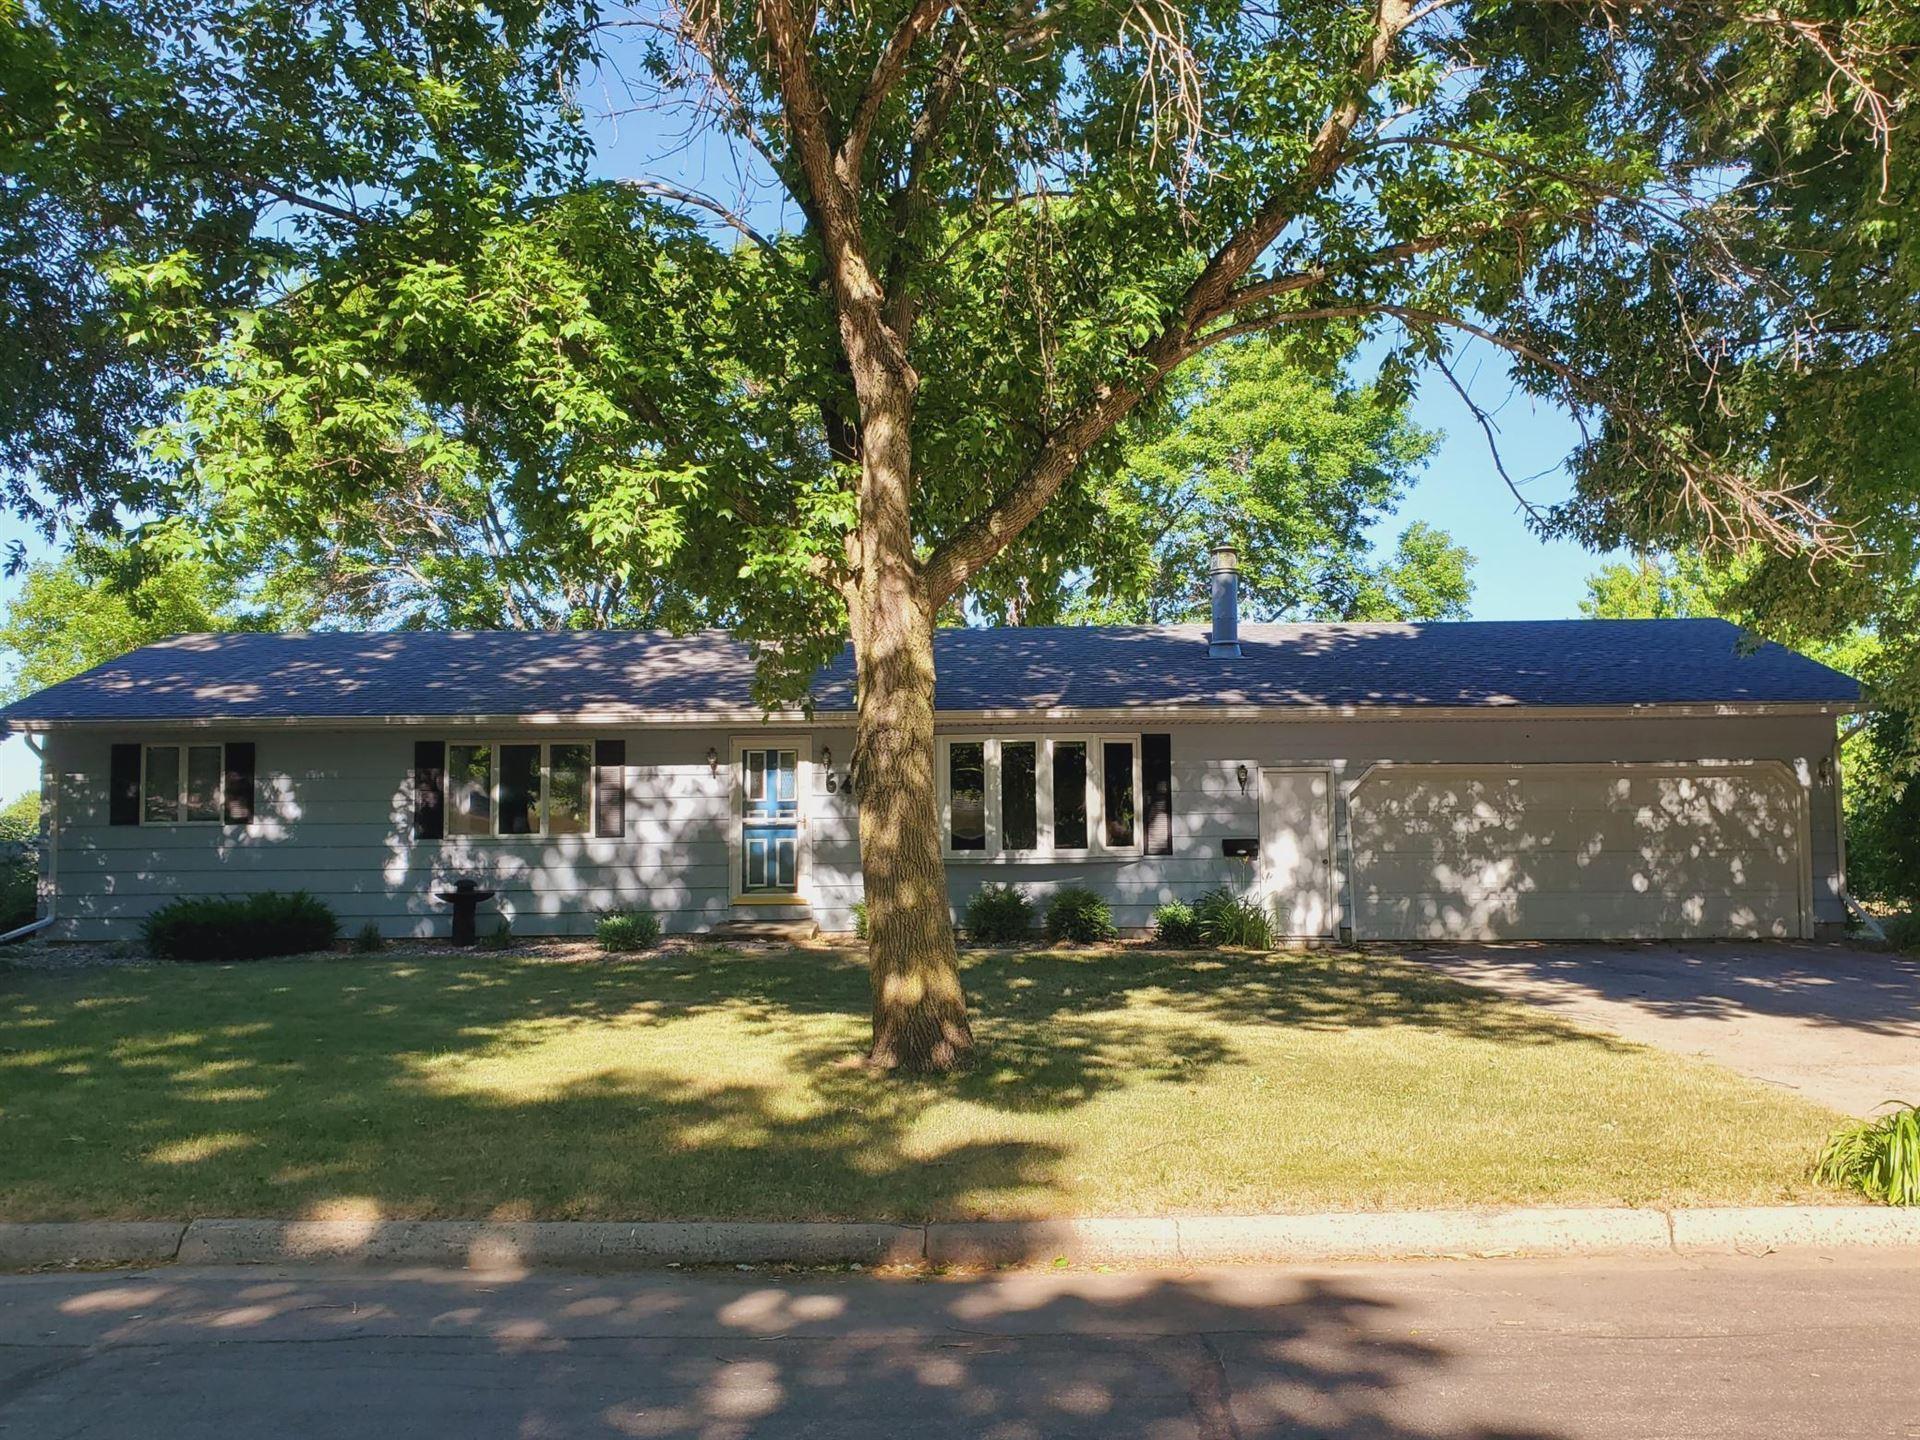 Photo of 64 S 5th Street, Cottonwood, MN 56229 (MLS # 6012261)